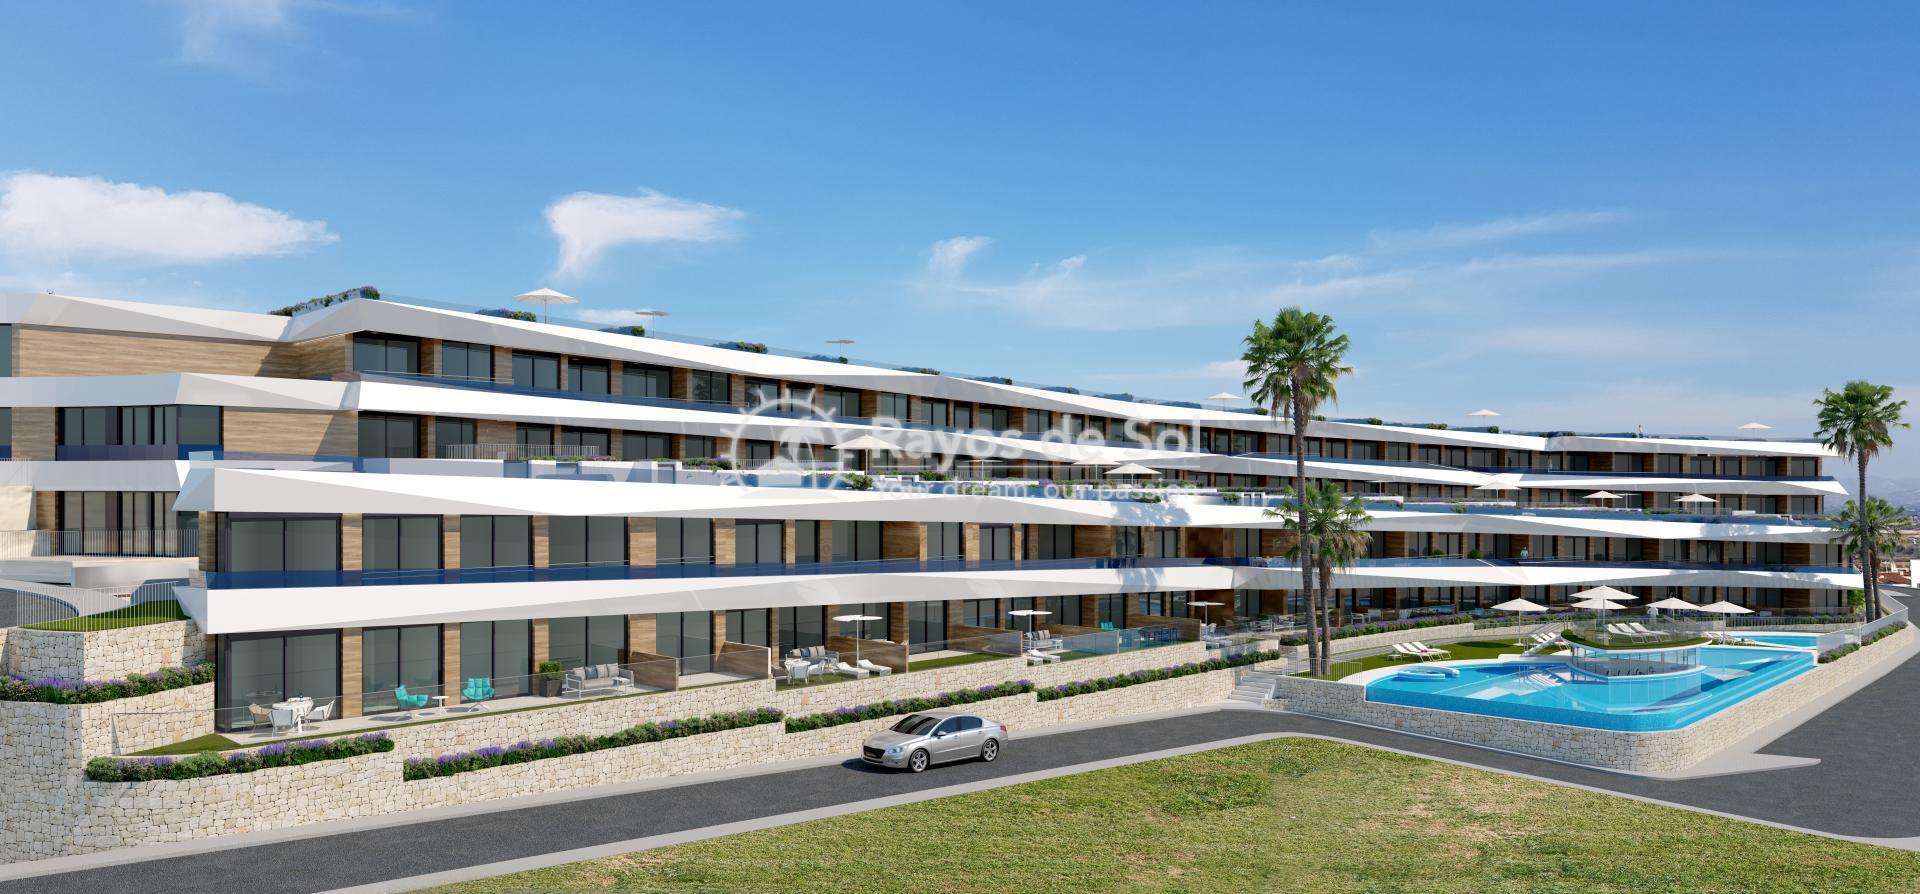 Apartment with seaviews  in Santa Pola, Costa Blanca (Aura apt2d) - 11